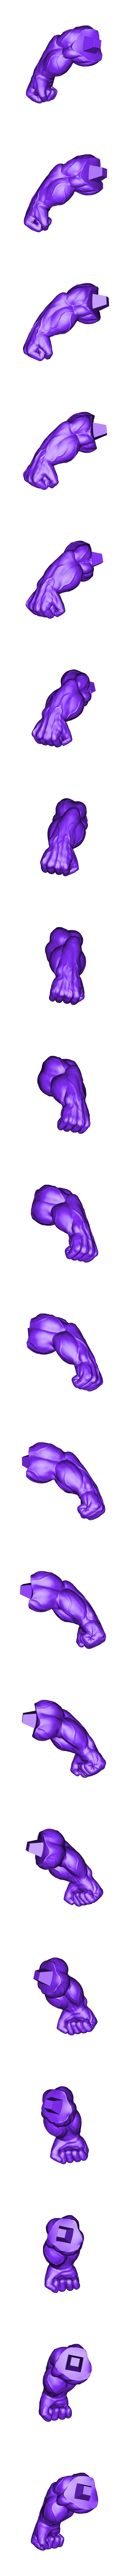 Rhand_300mm.stl Download STL file Hulk Angry - Super Hero - Marvel 3D print model • 3D print model, Bstar3Dart